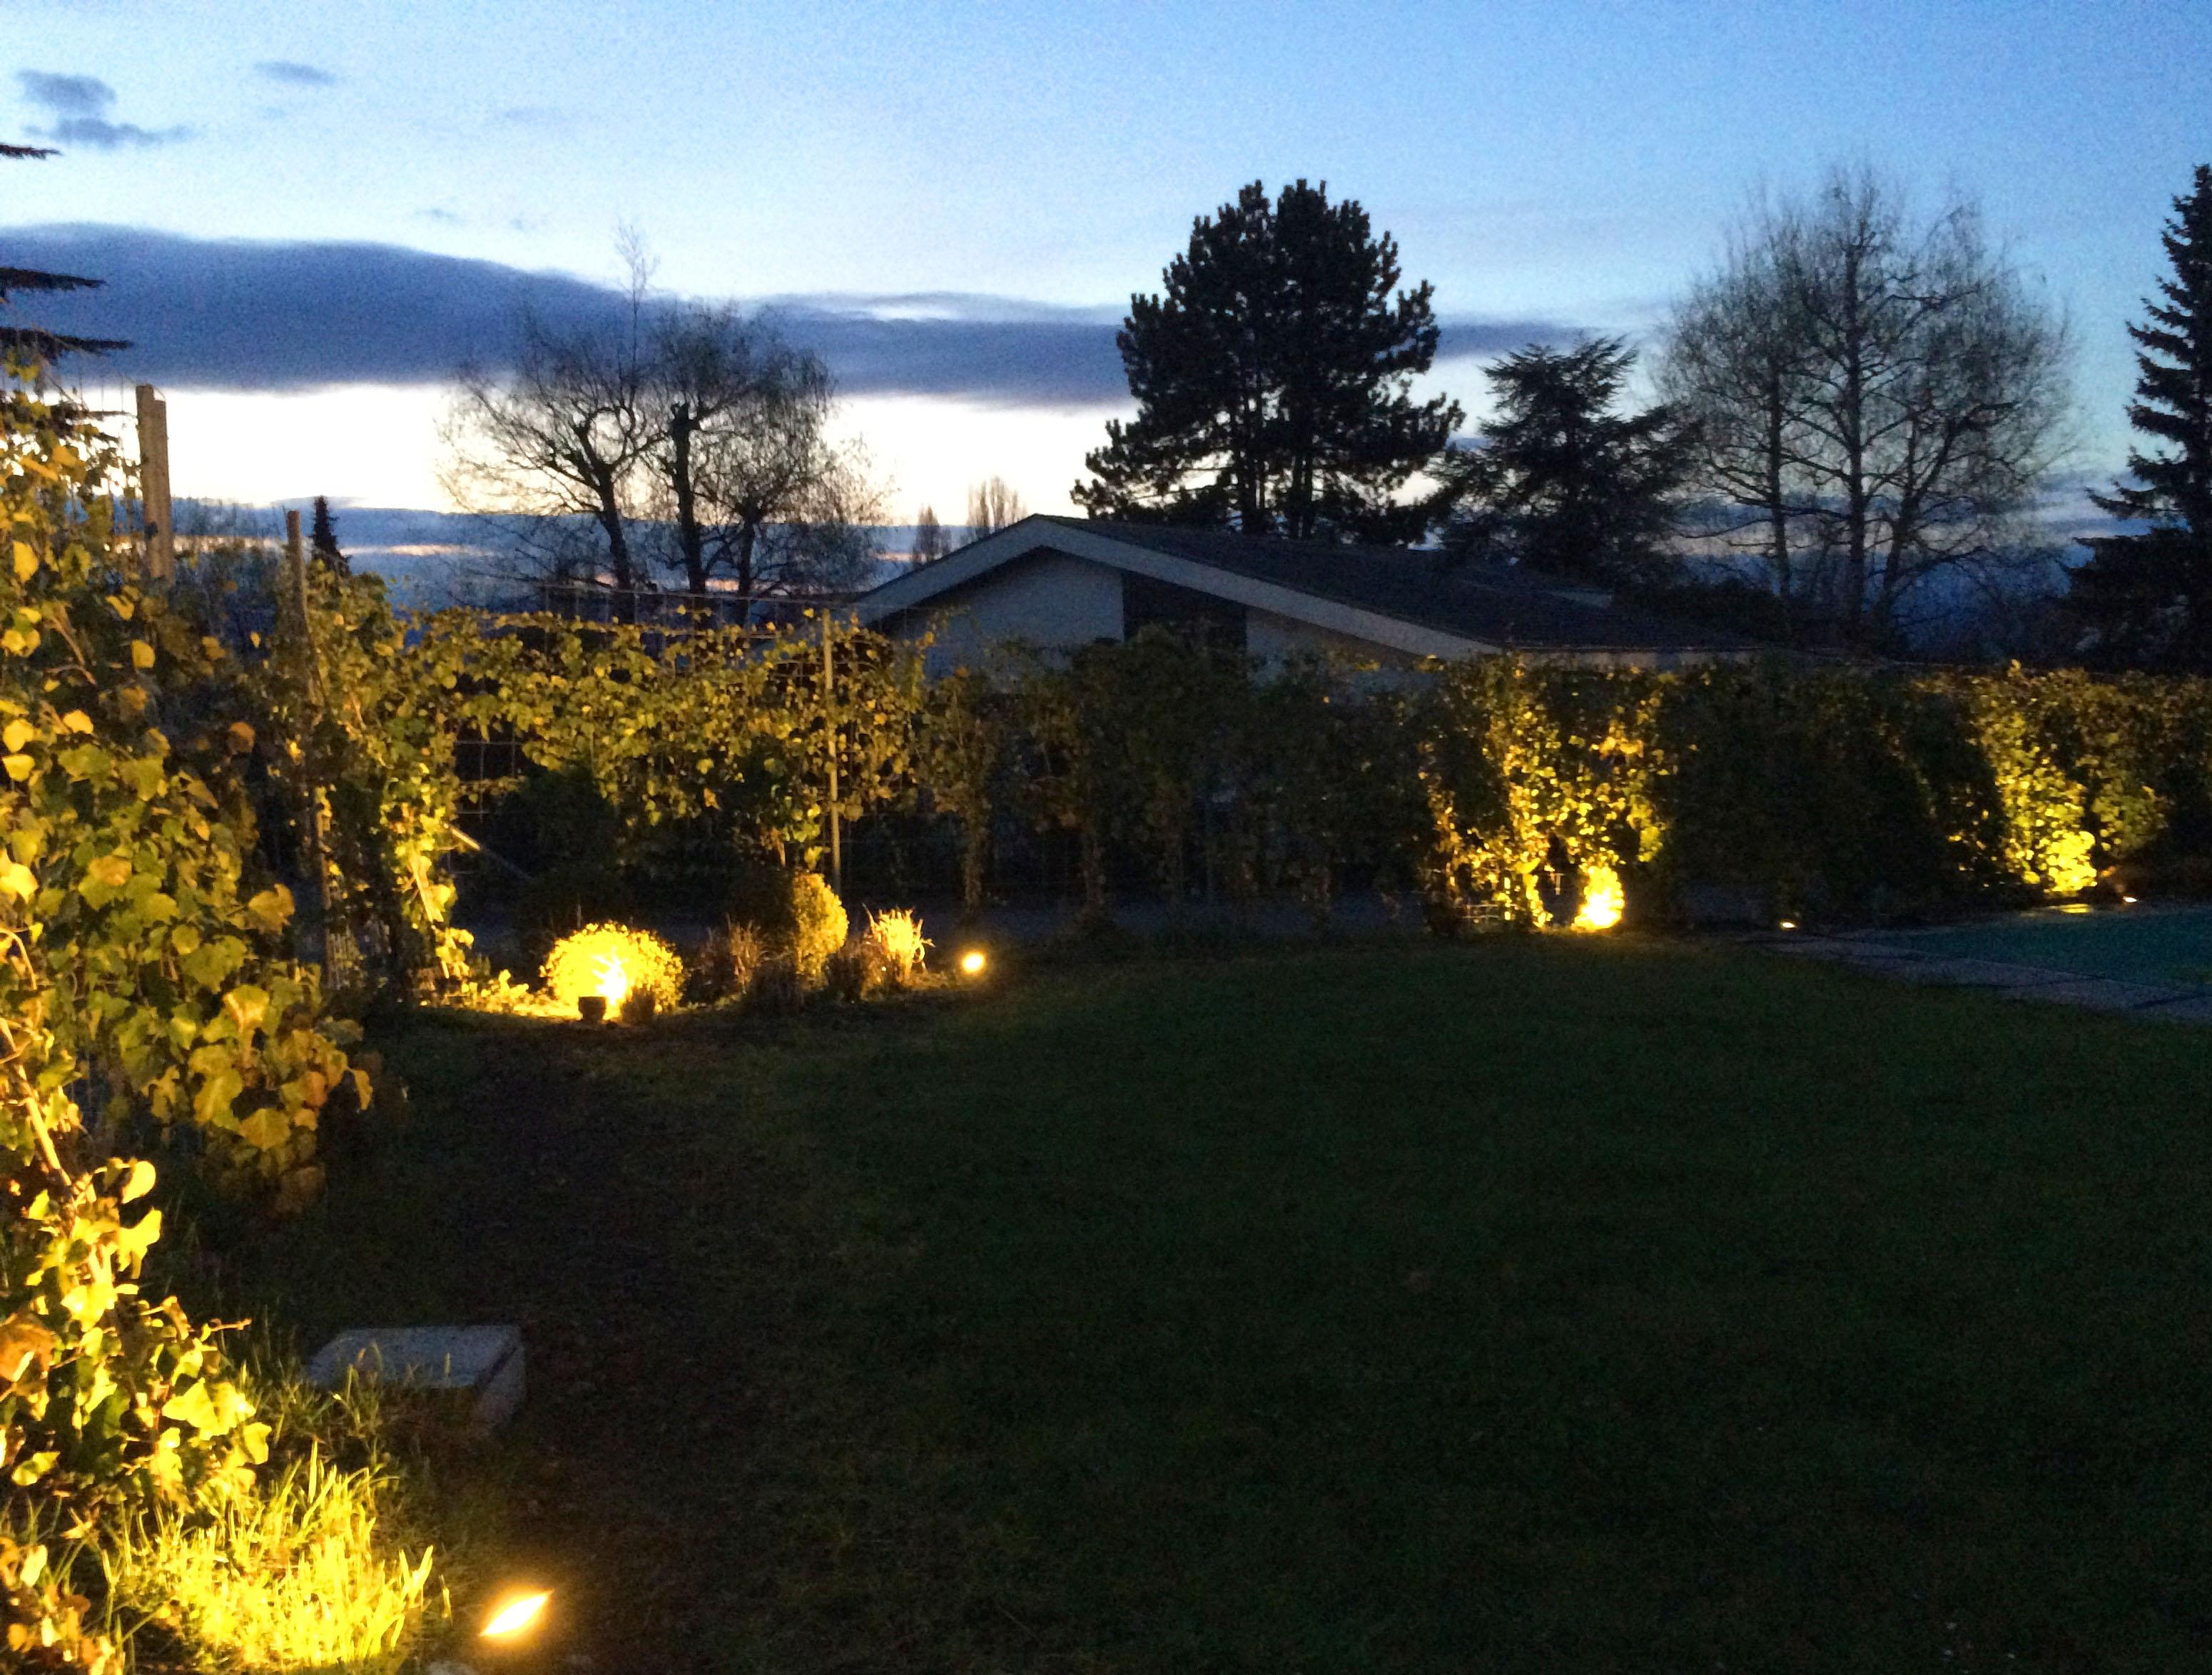 Joli jardin eclair a gen ve jardins de nuit renaud serniclay for Eclairage d un jardin